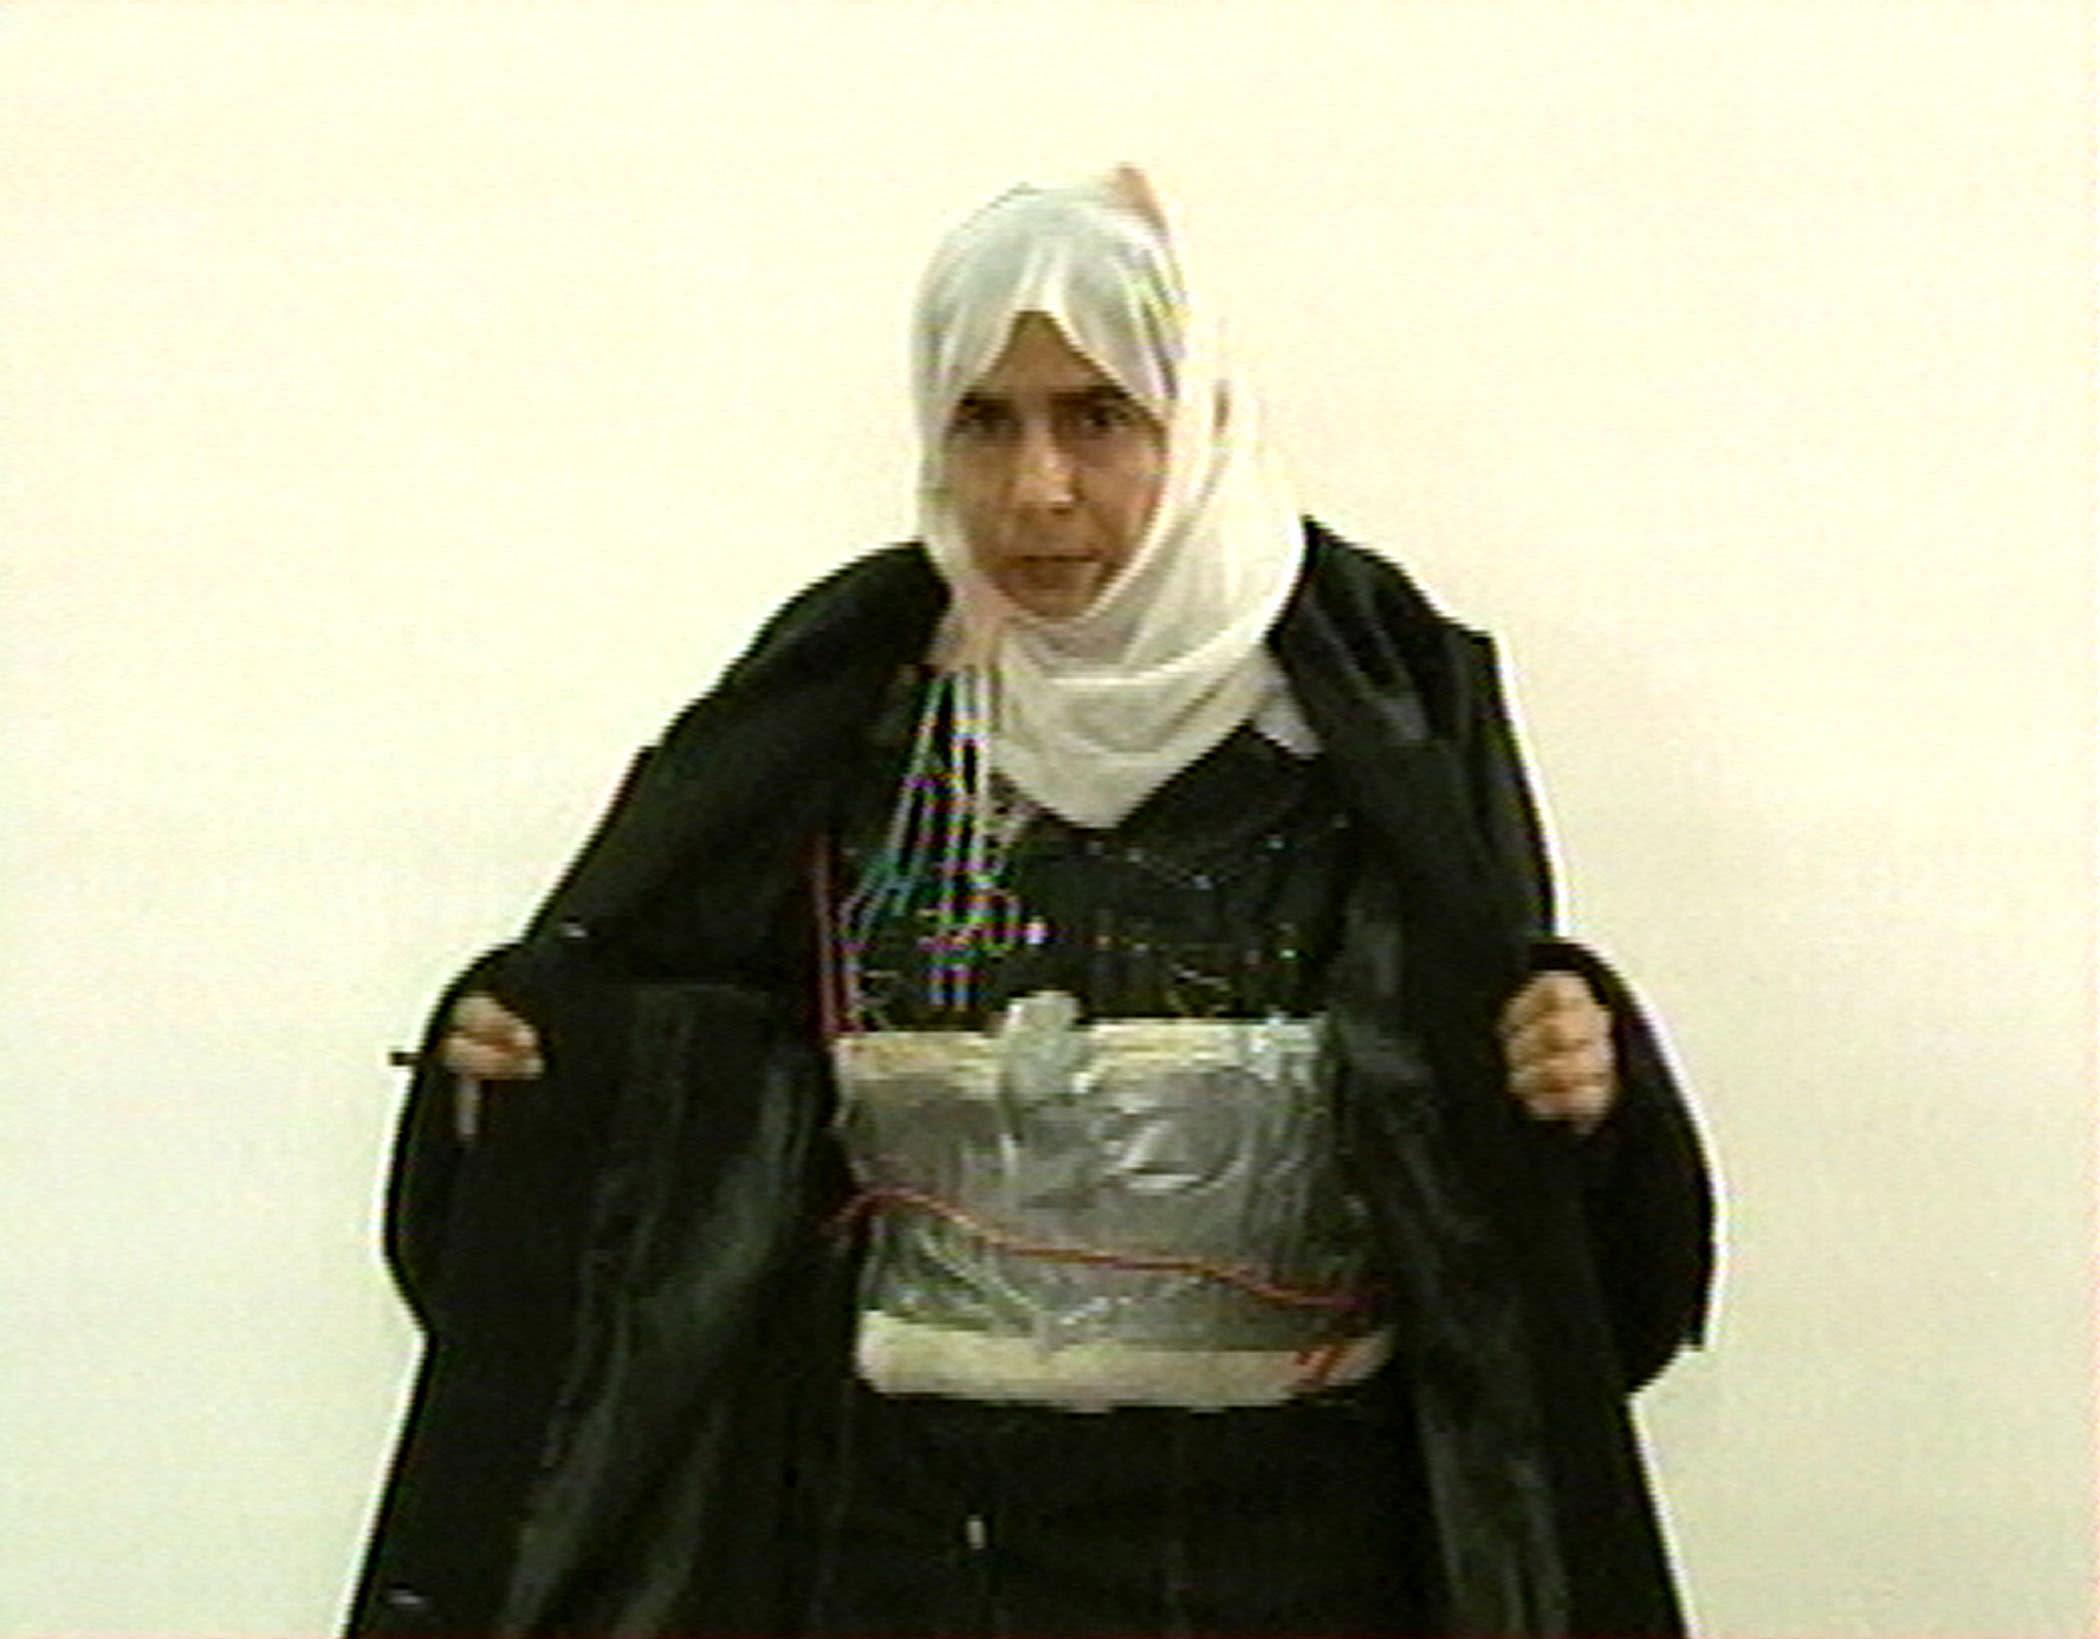 Sajida al-Rishawi: Who is the failed suicide bomber IS wants in prisoner exchange?